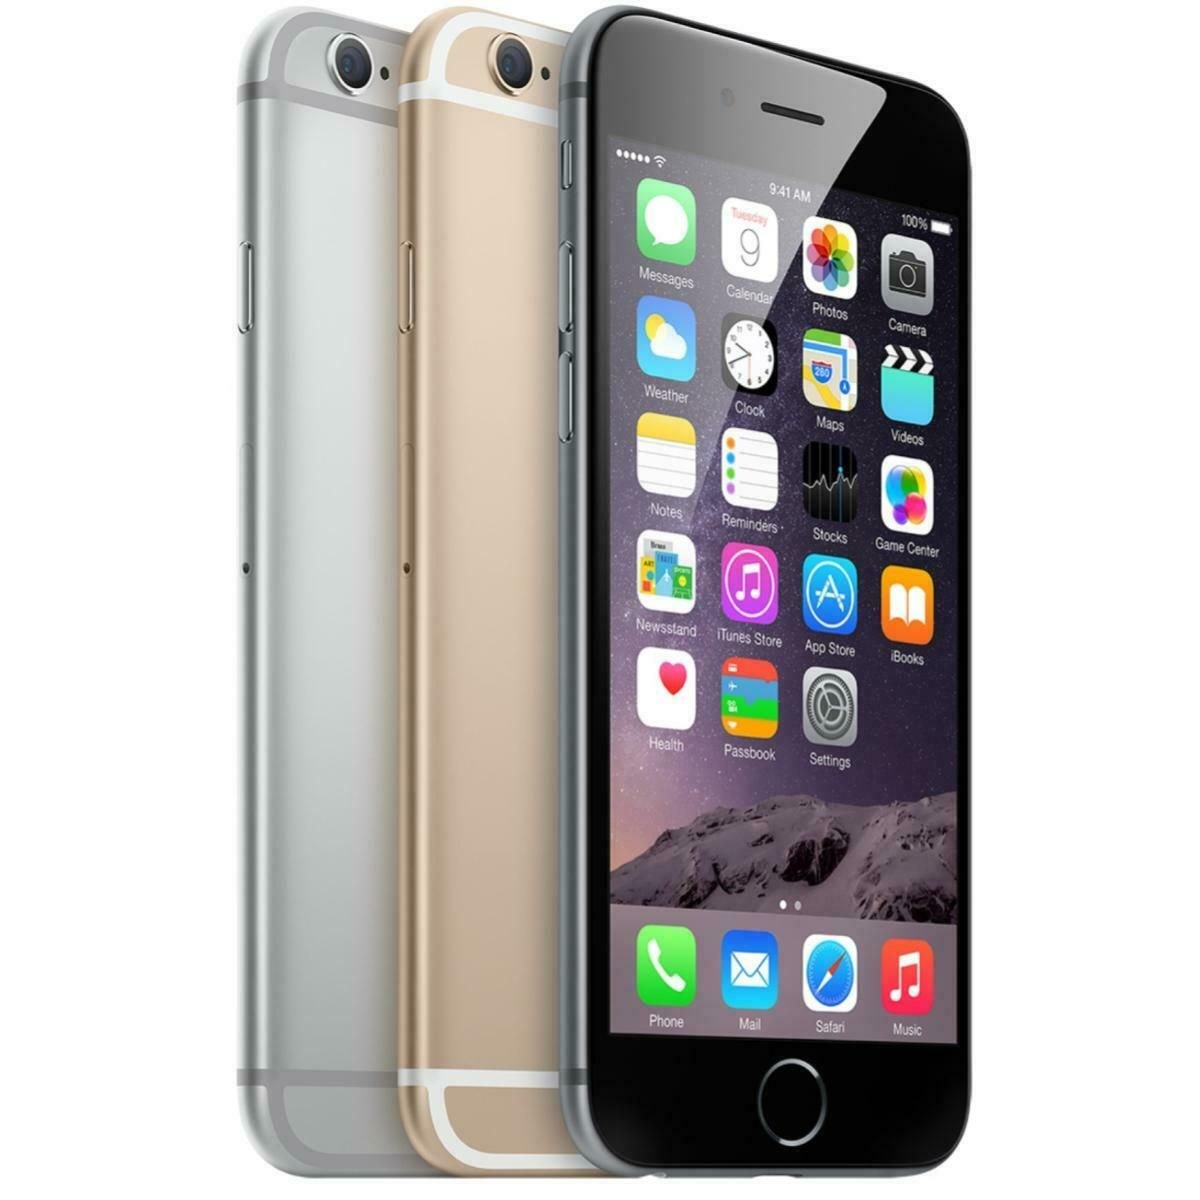 Apple iPhone 6 16/64/128GB GSM Unlocked 4G LTE iOS